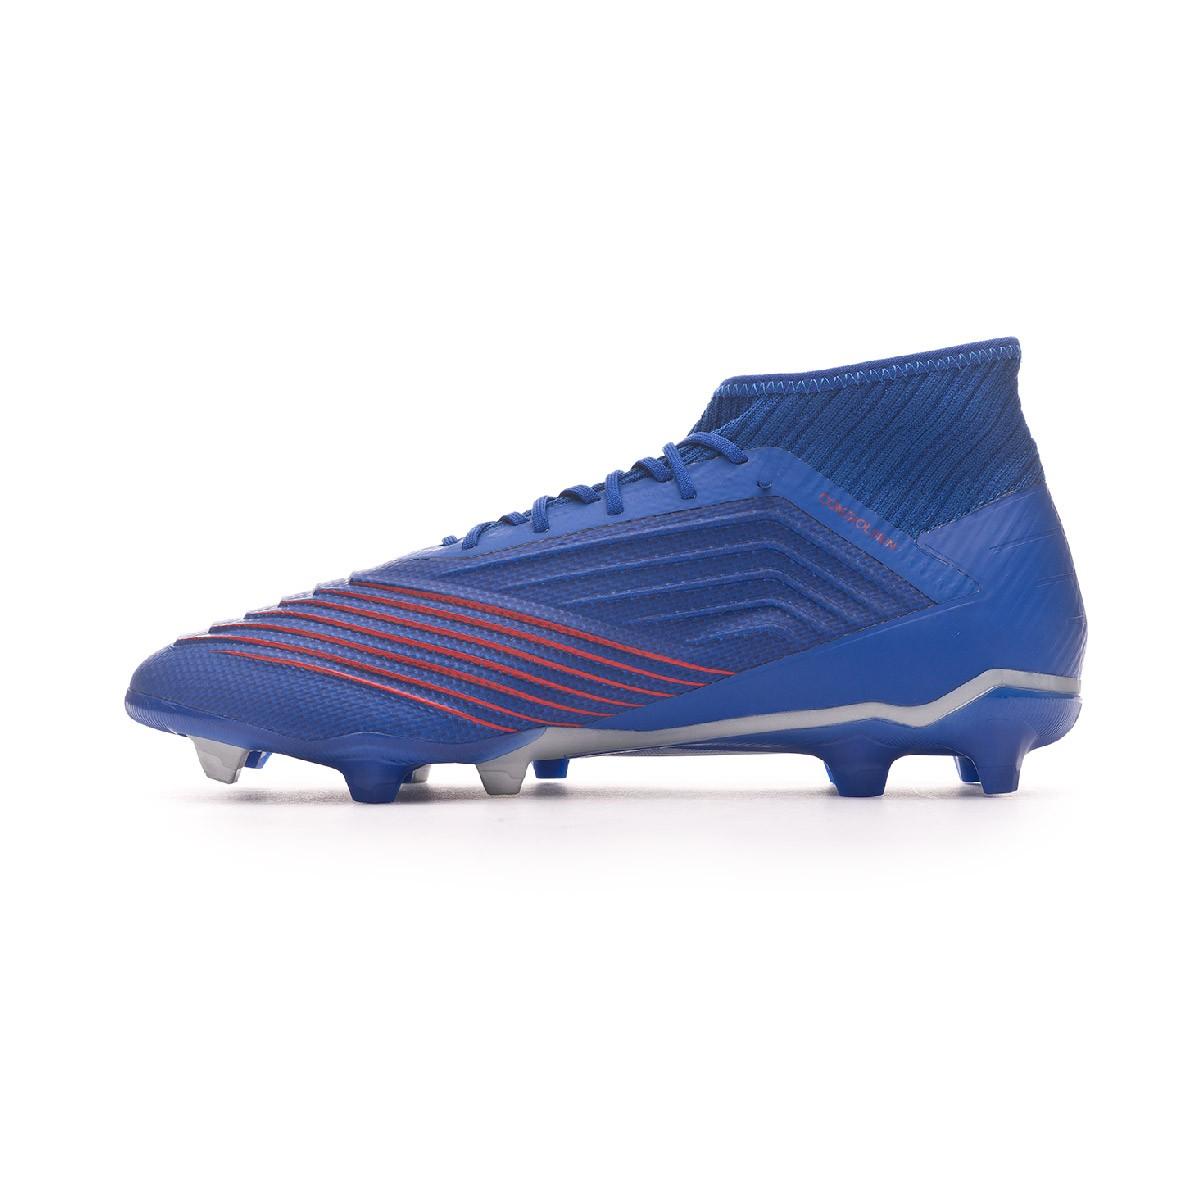 Blue Metallic Fg Football Bota 2 Bold 19 Silver Predator PZuTXiOkw